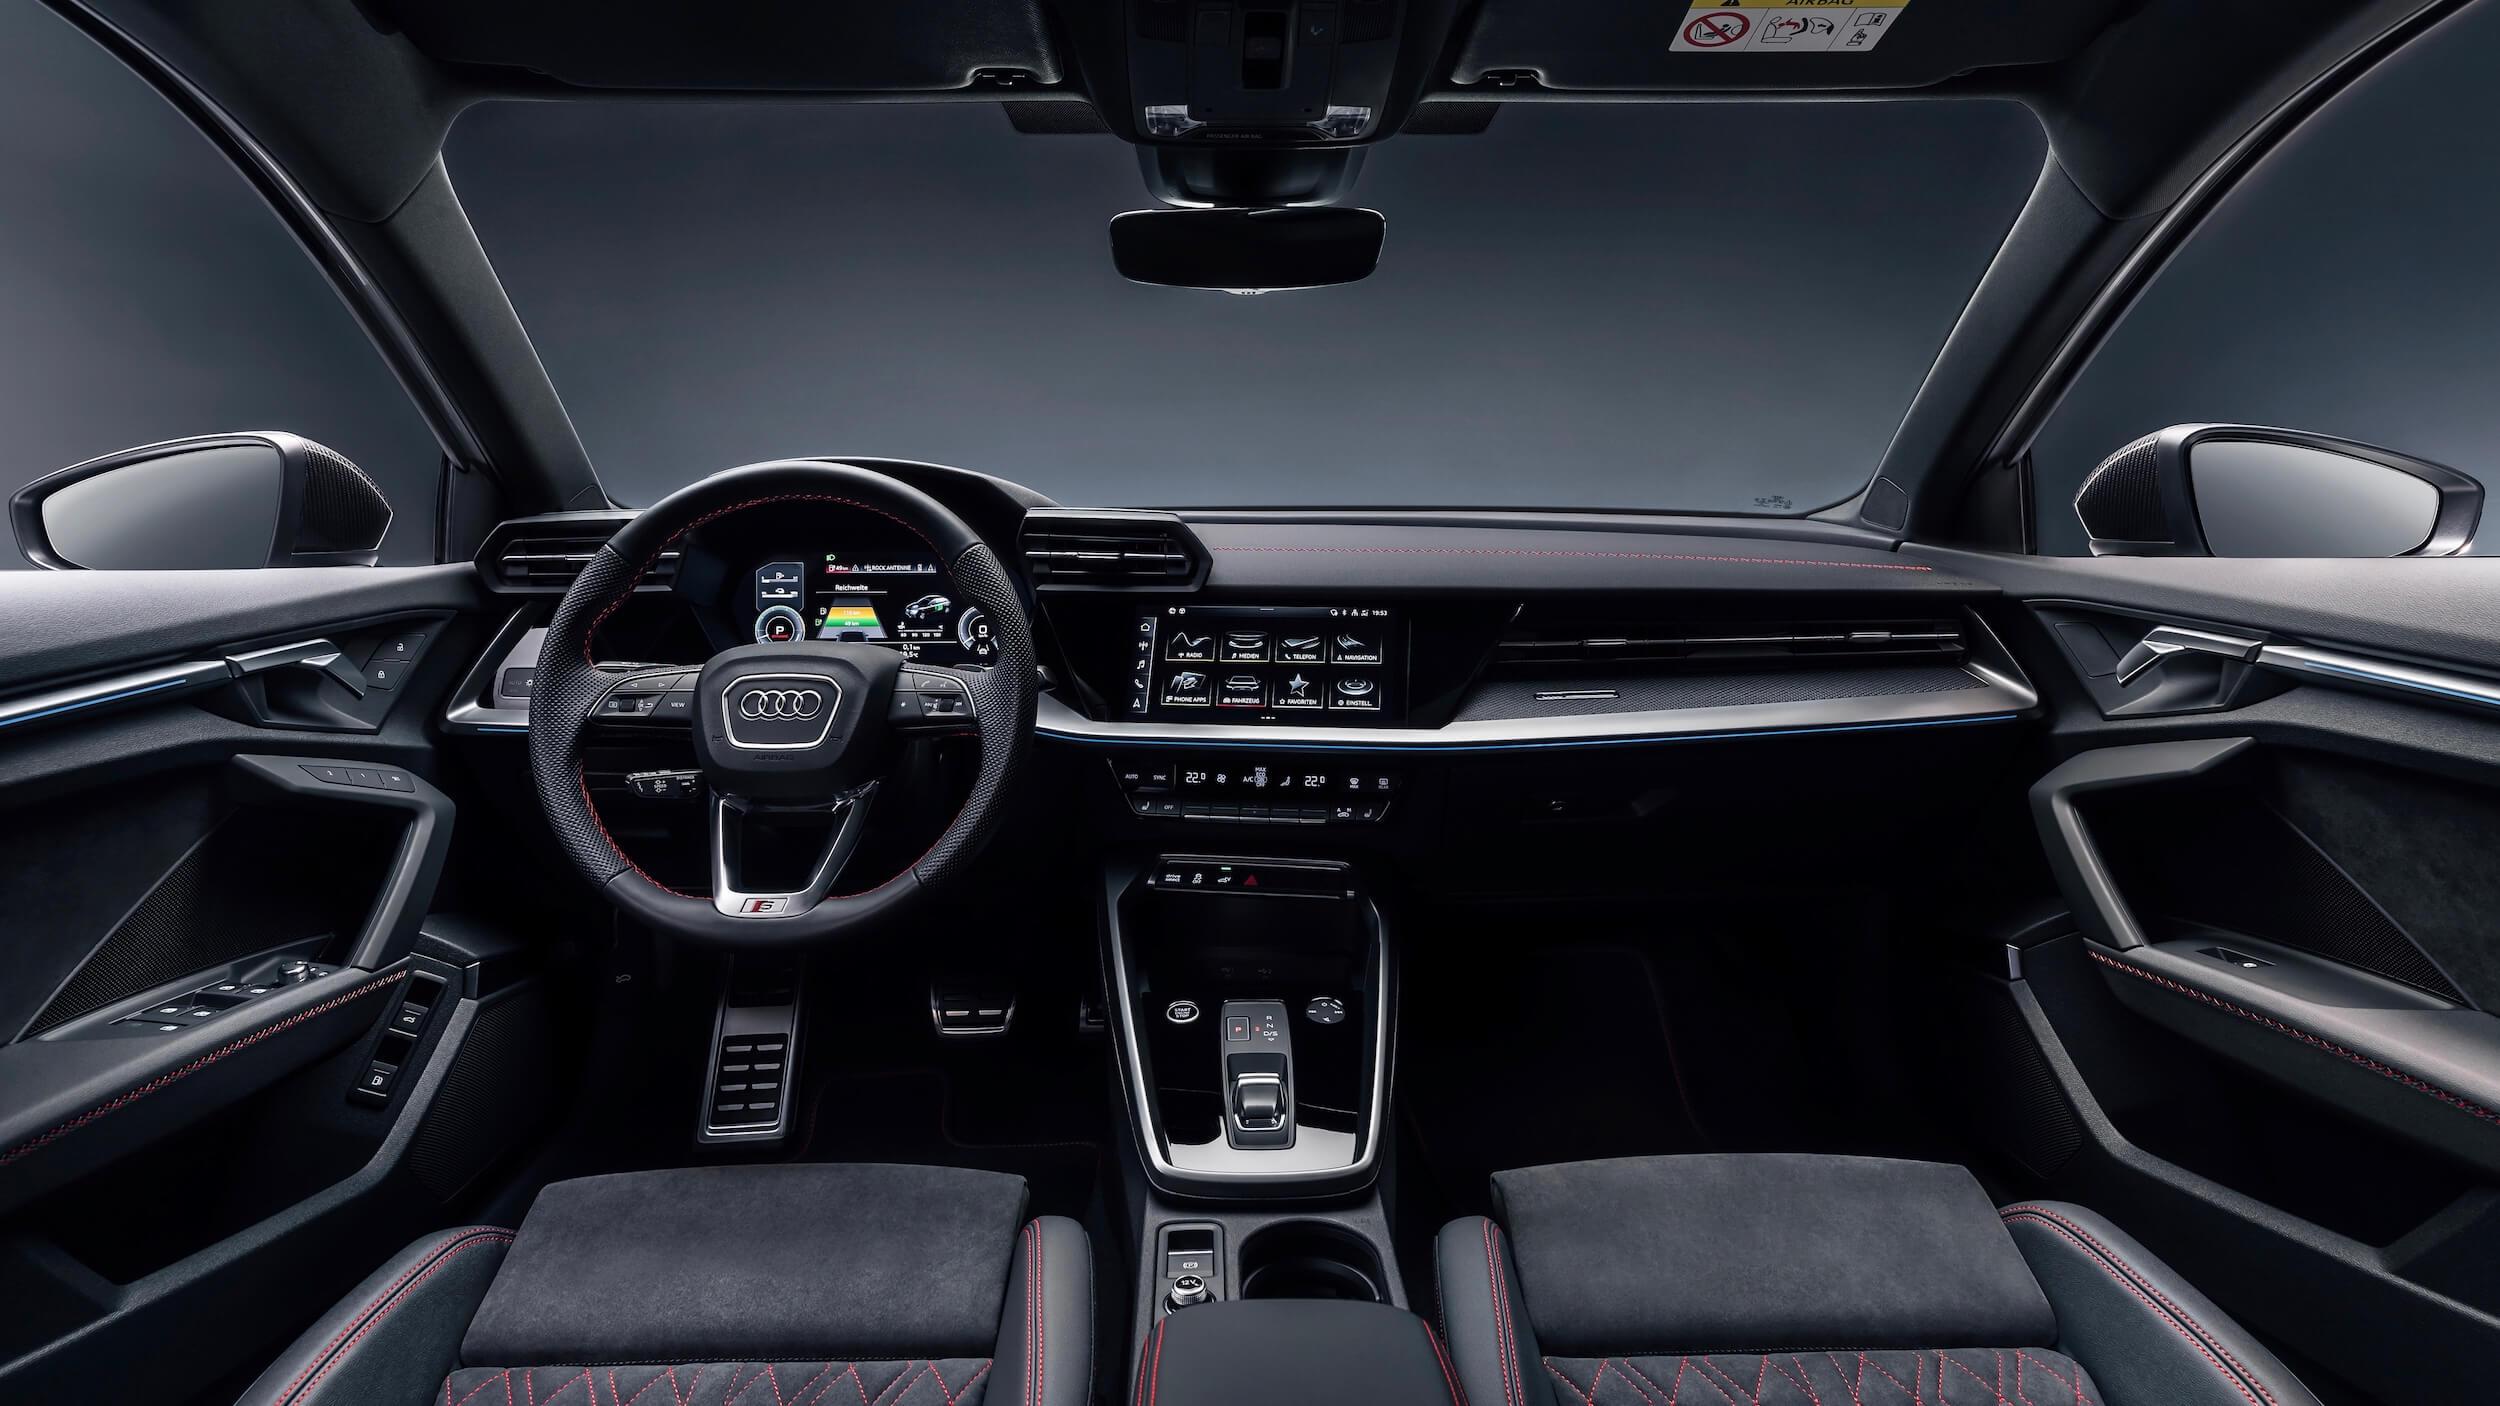 Audi A3 Sportback 45 TFSIe dashboard